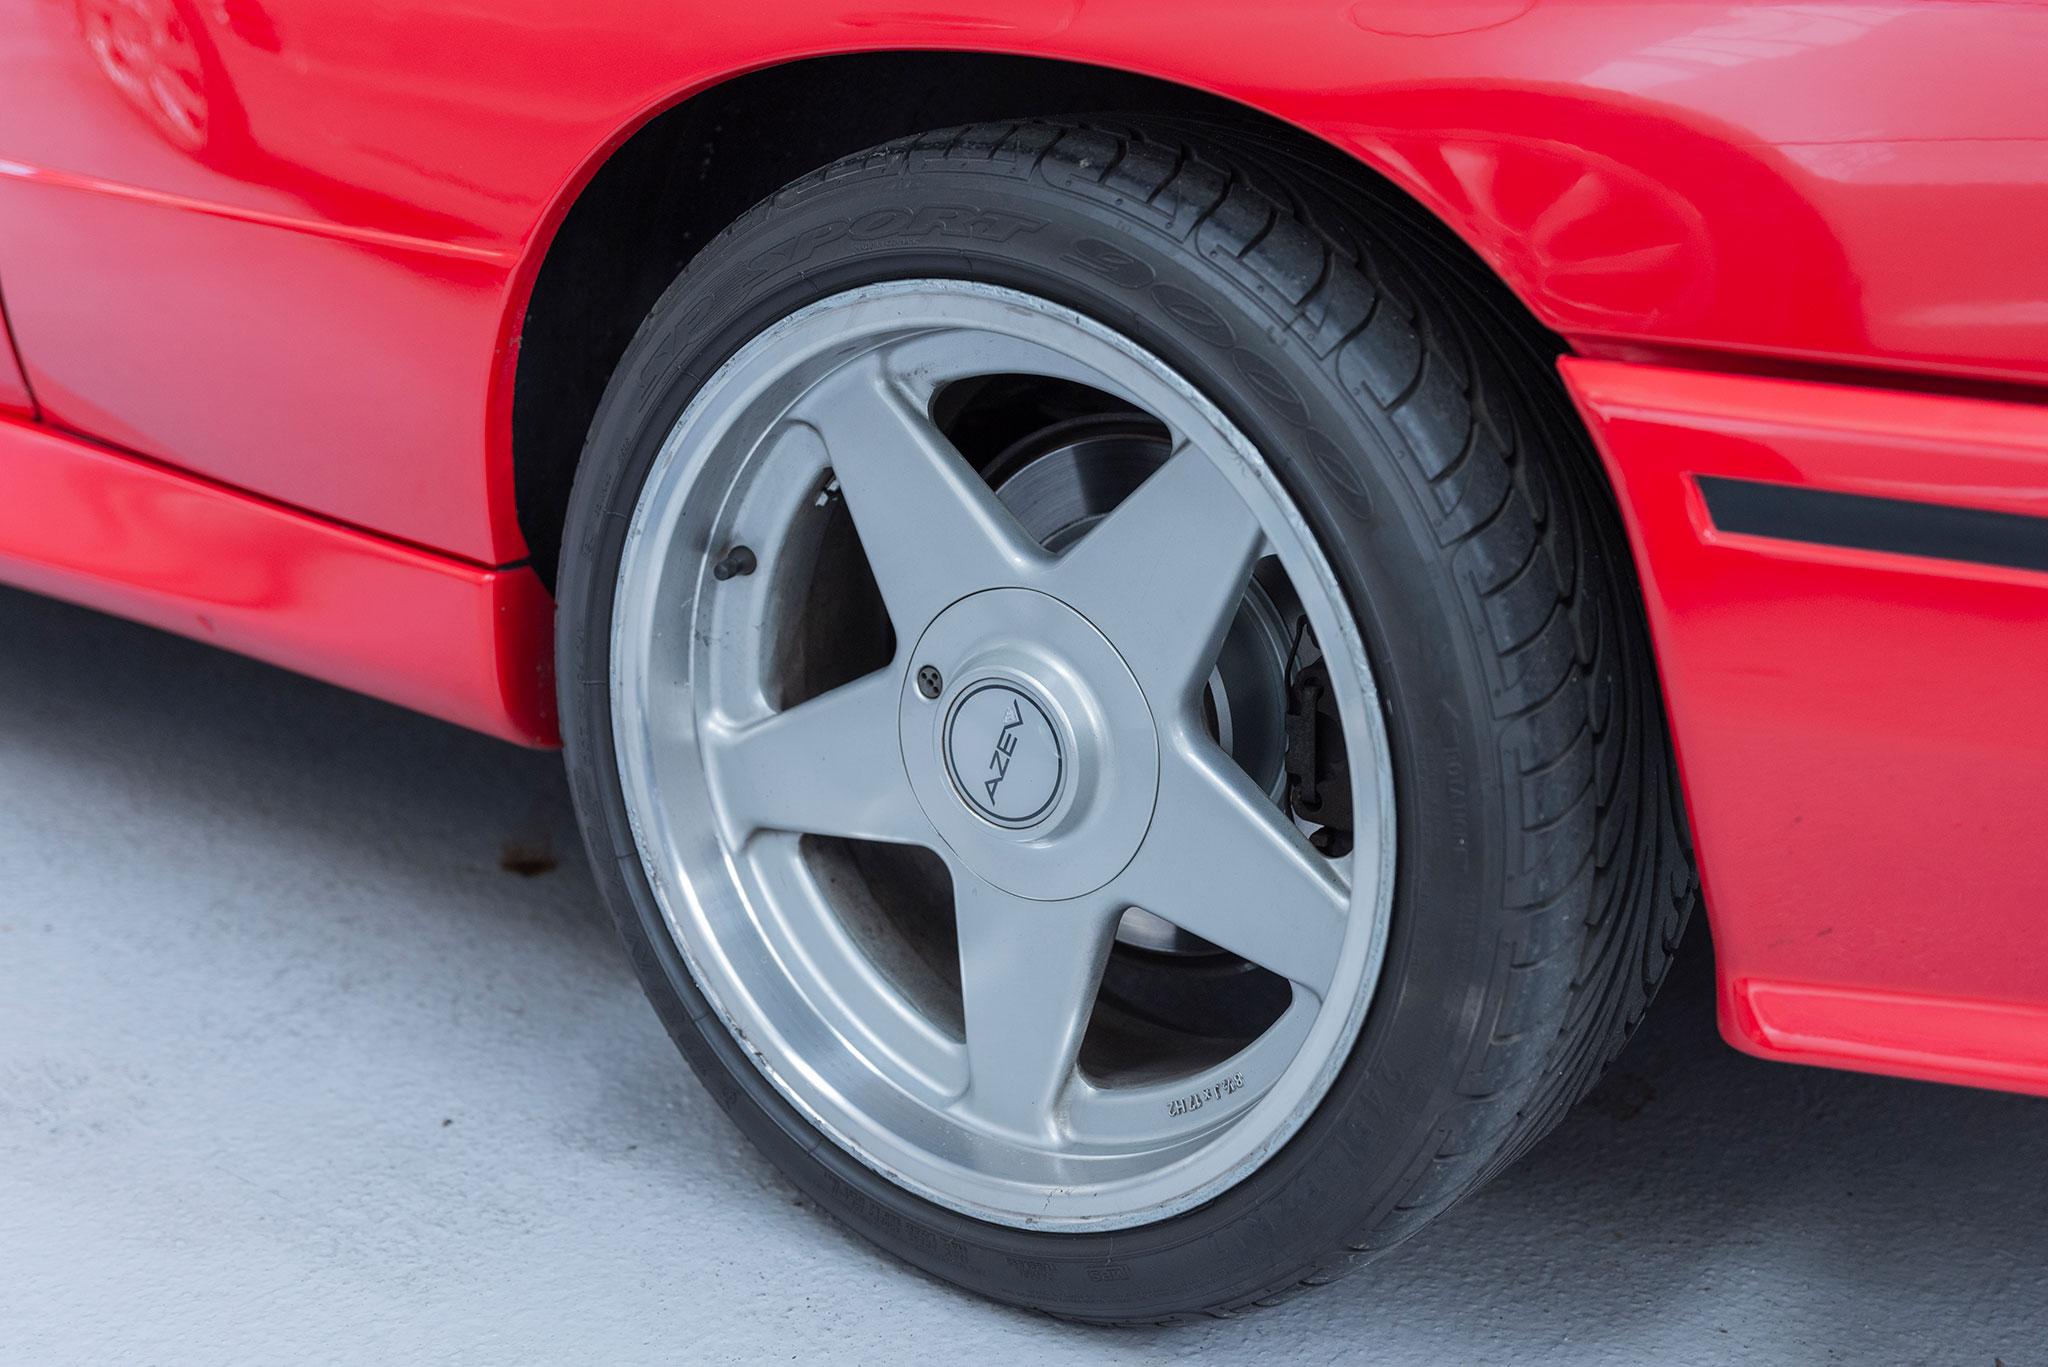 1991 BMW M3 E30 Cabriolet jante AZEV 17 pouces homologuée.